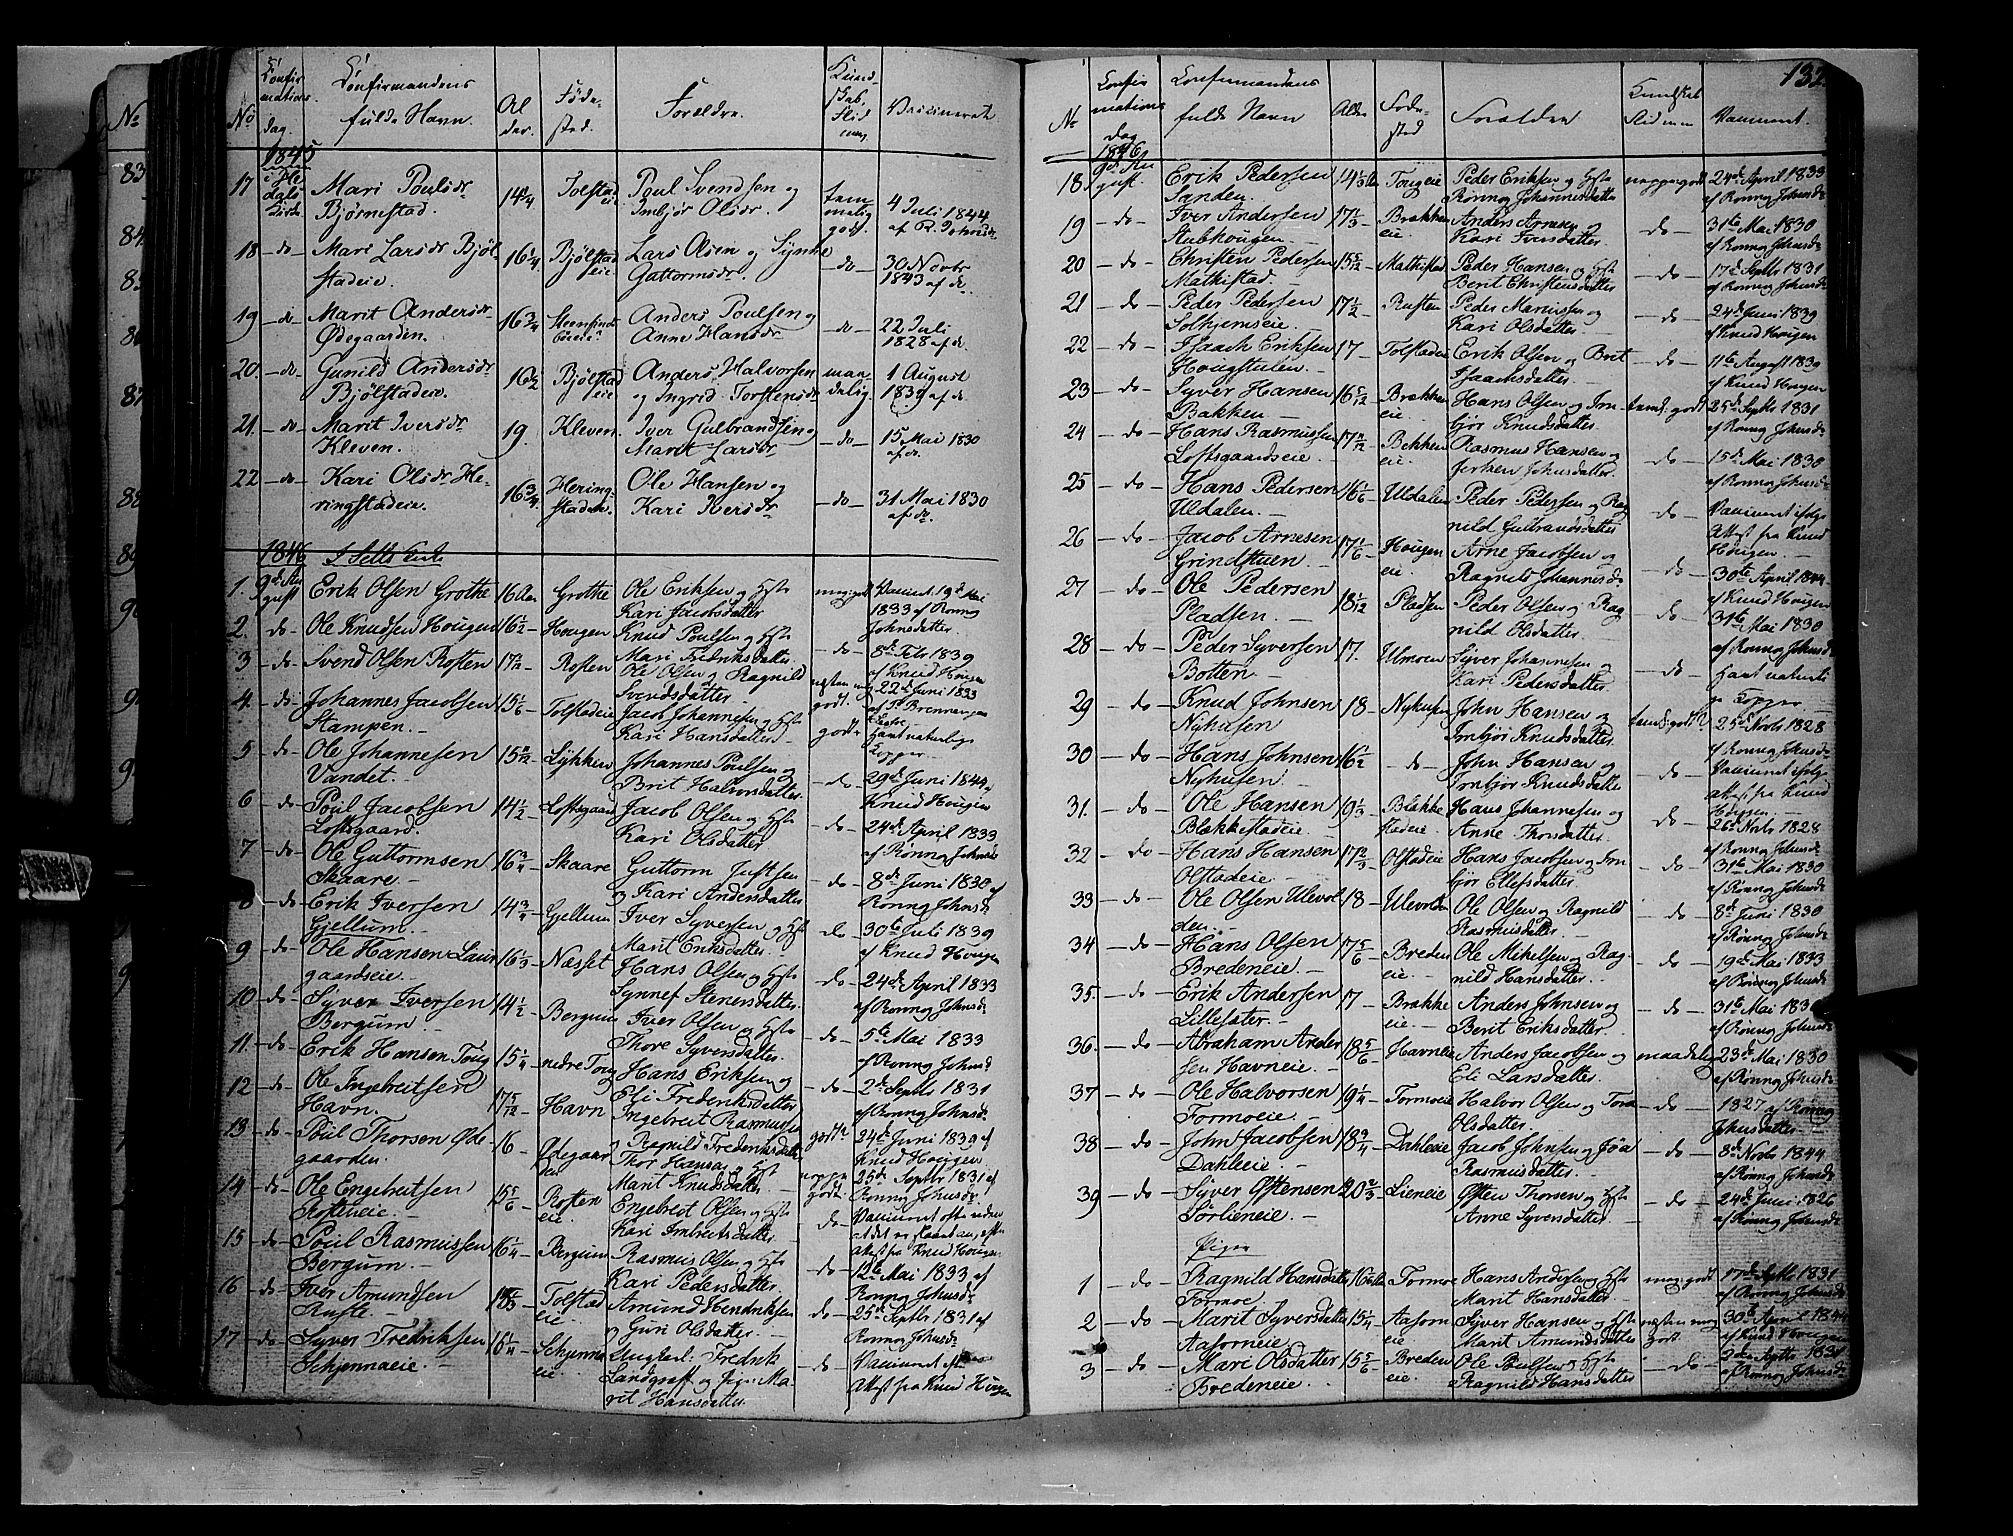 SAH, Vågå prestekontor, Ministerialbok nr. 5 /1, 1842-1856, s. 132